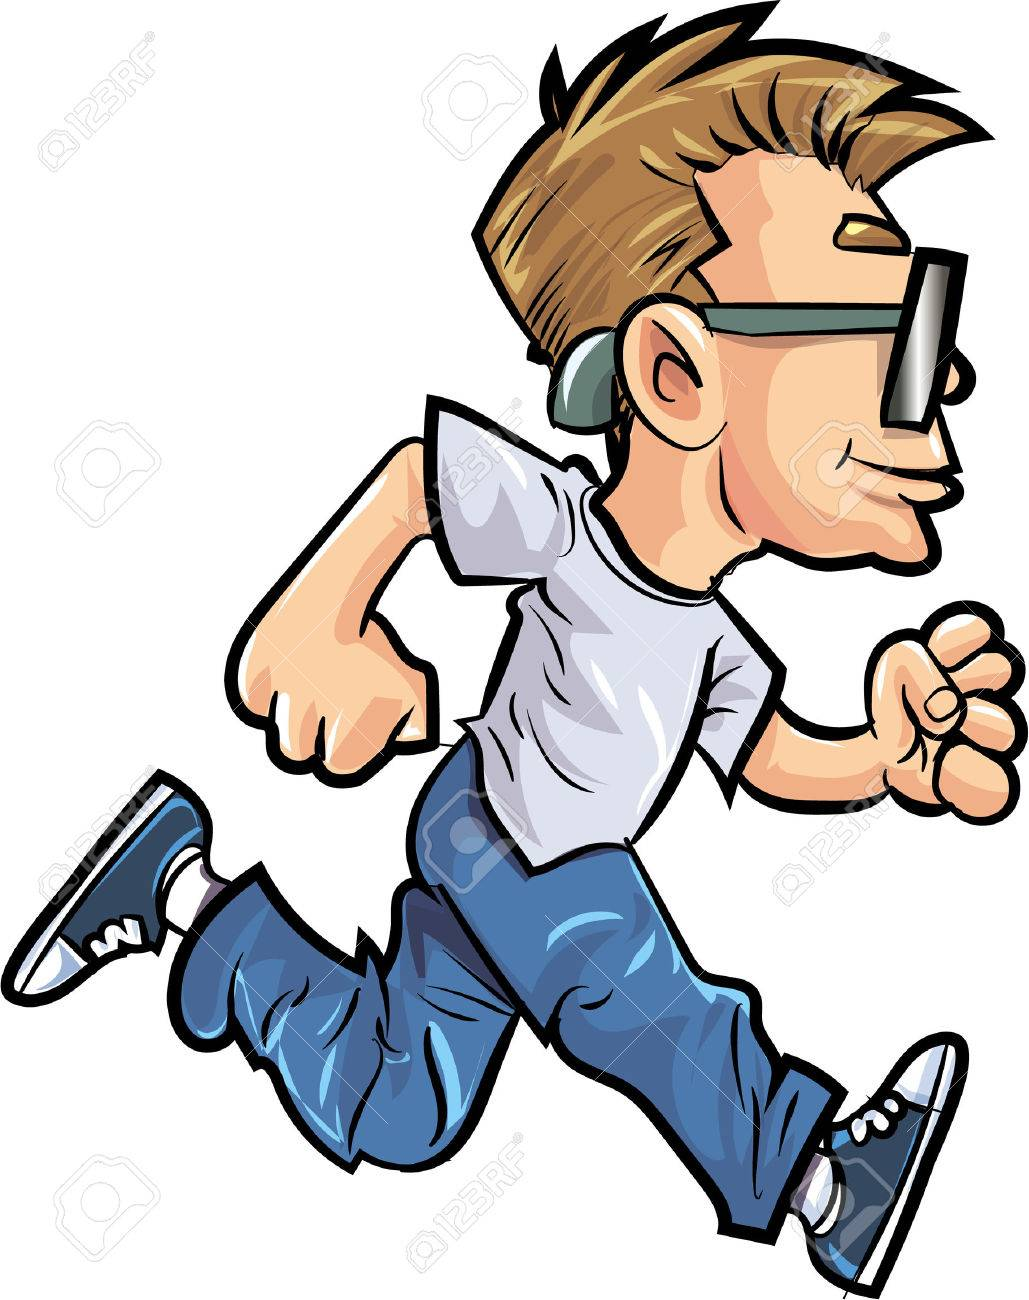 cartoon running man with glasses isolated royalty free cliparts rh 123rf com cartoon person running fast cartoon guy running late